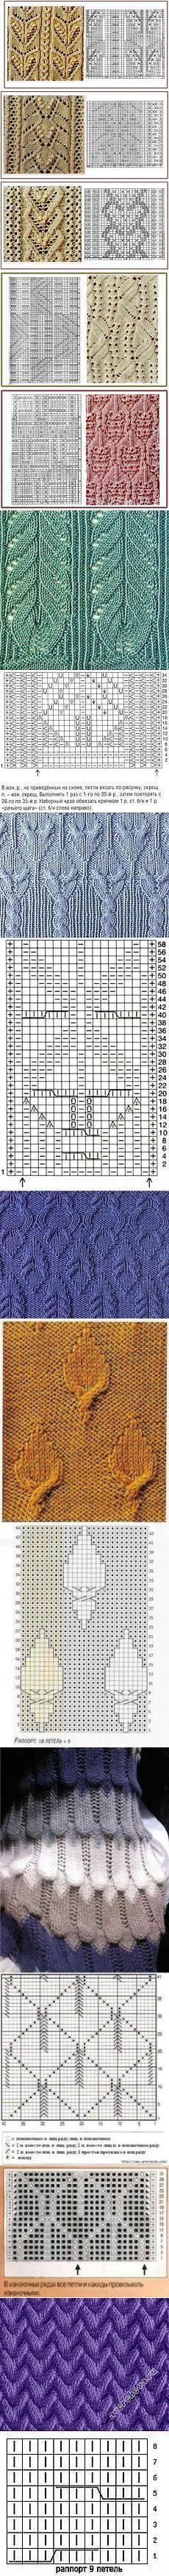 (80) embossed twining vine leaf pattern - great site that maps your stitches for easier reading!!! | Adījumu raksti, tehnika